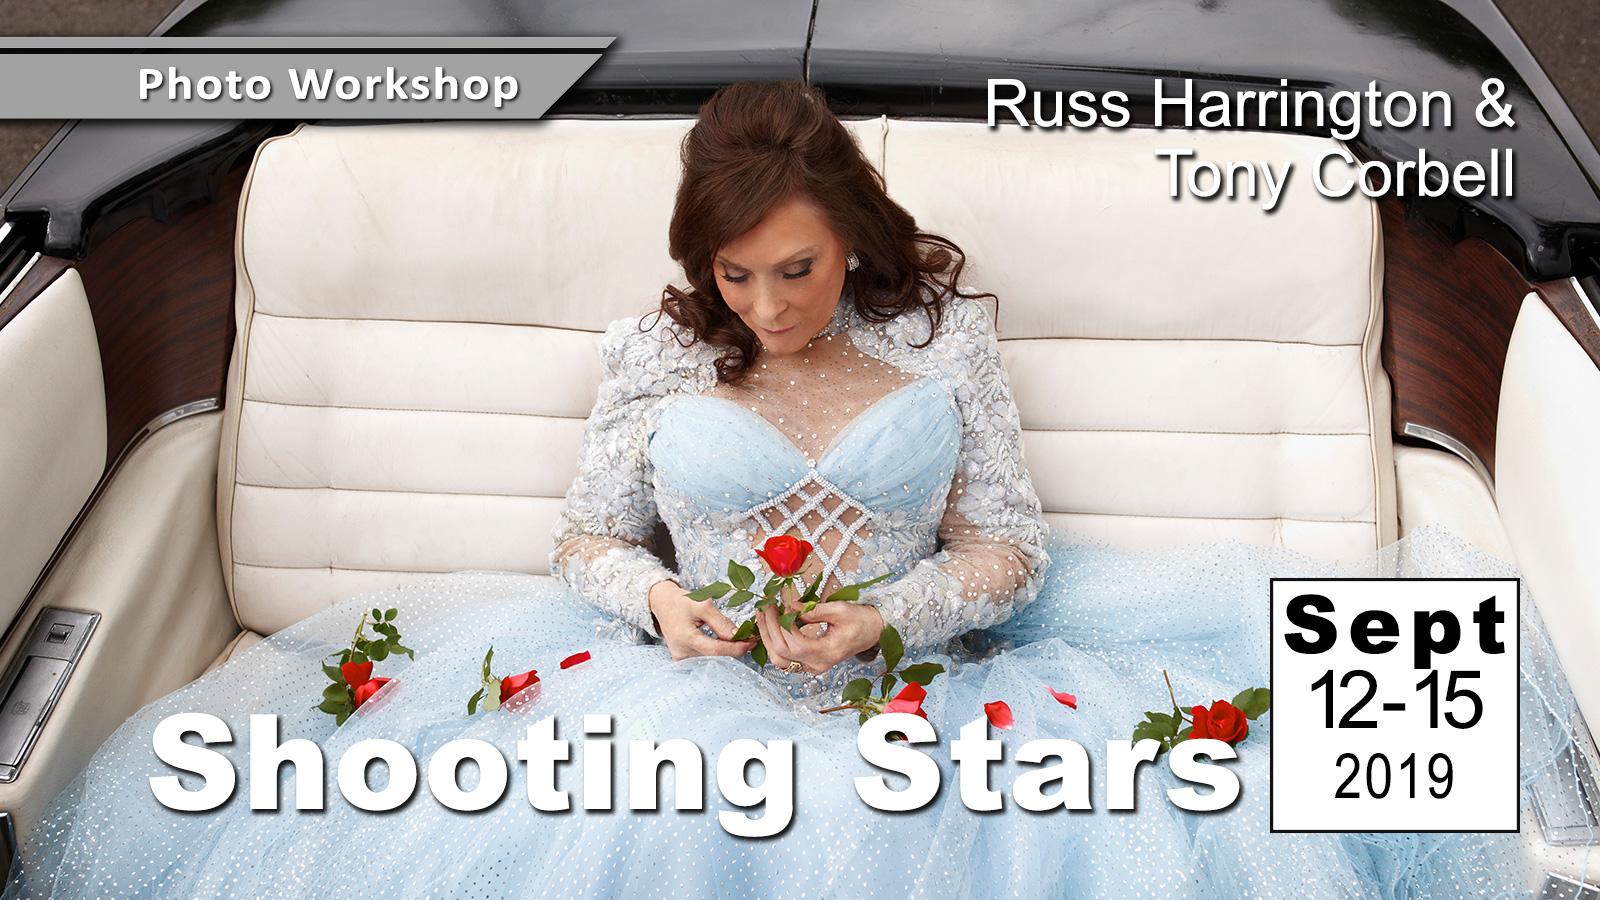 Shooting Stars 1600 x 900